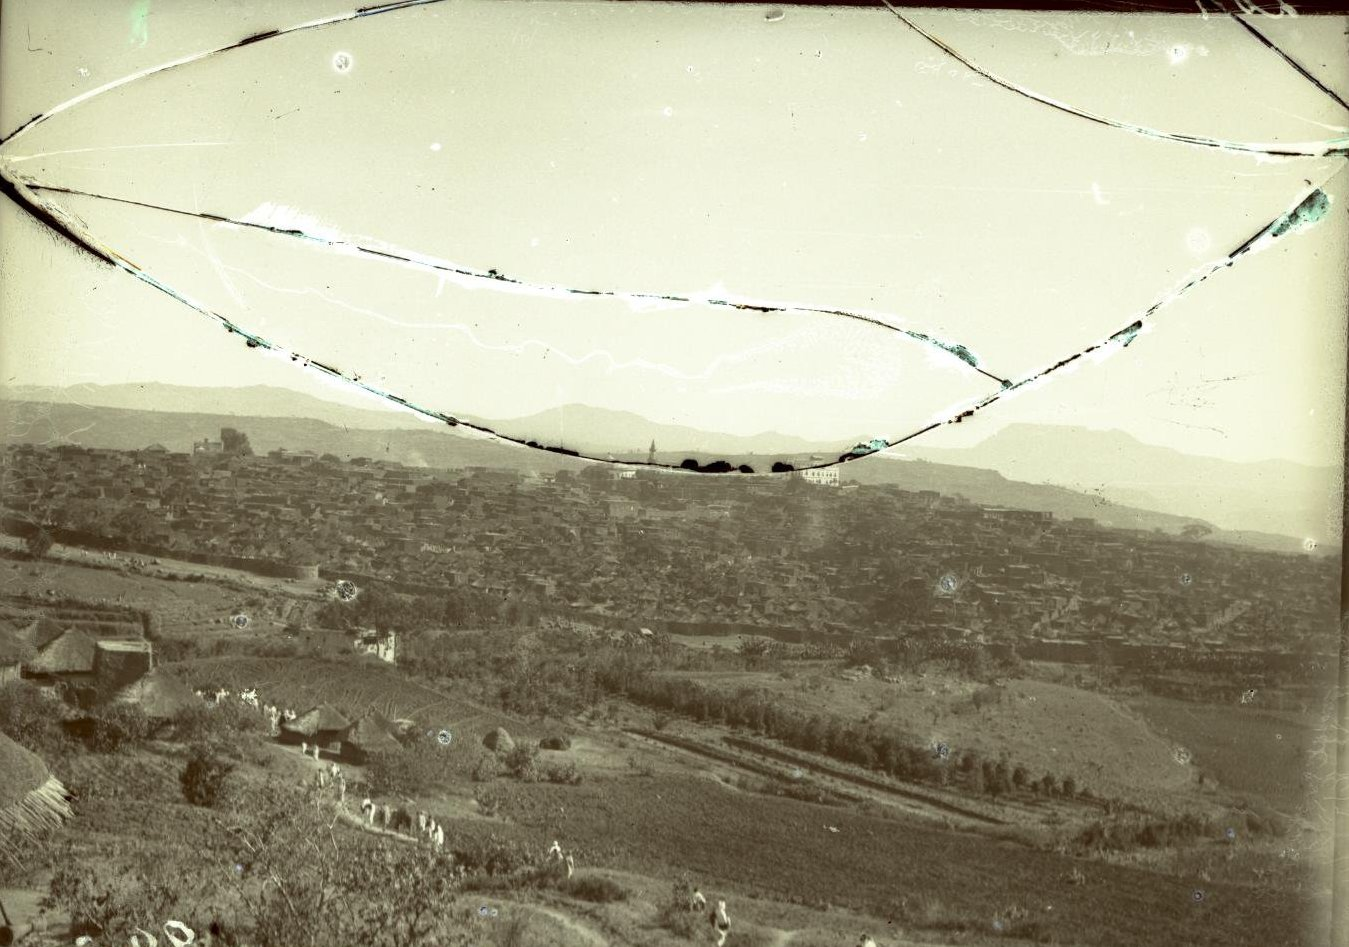 226. Абиссиния, провинция Харар, г. Харар. Общий вид